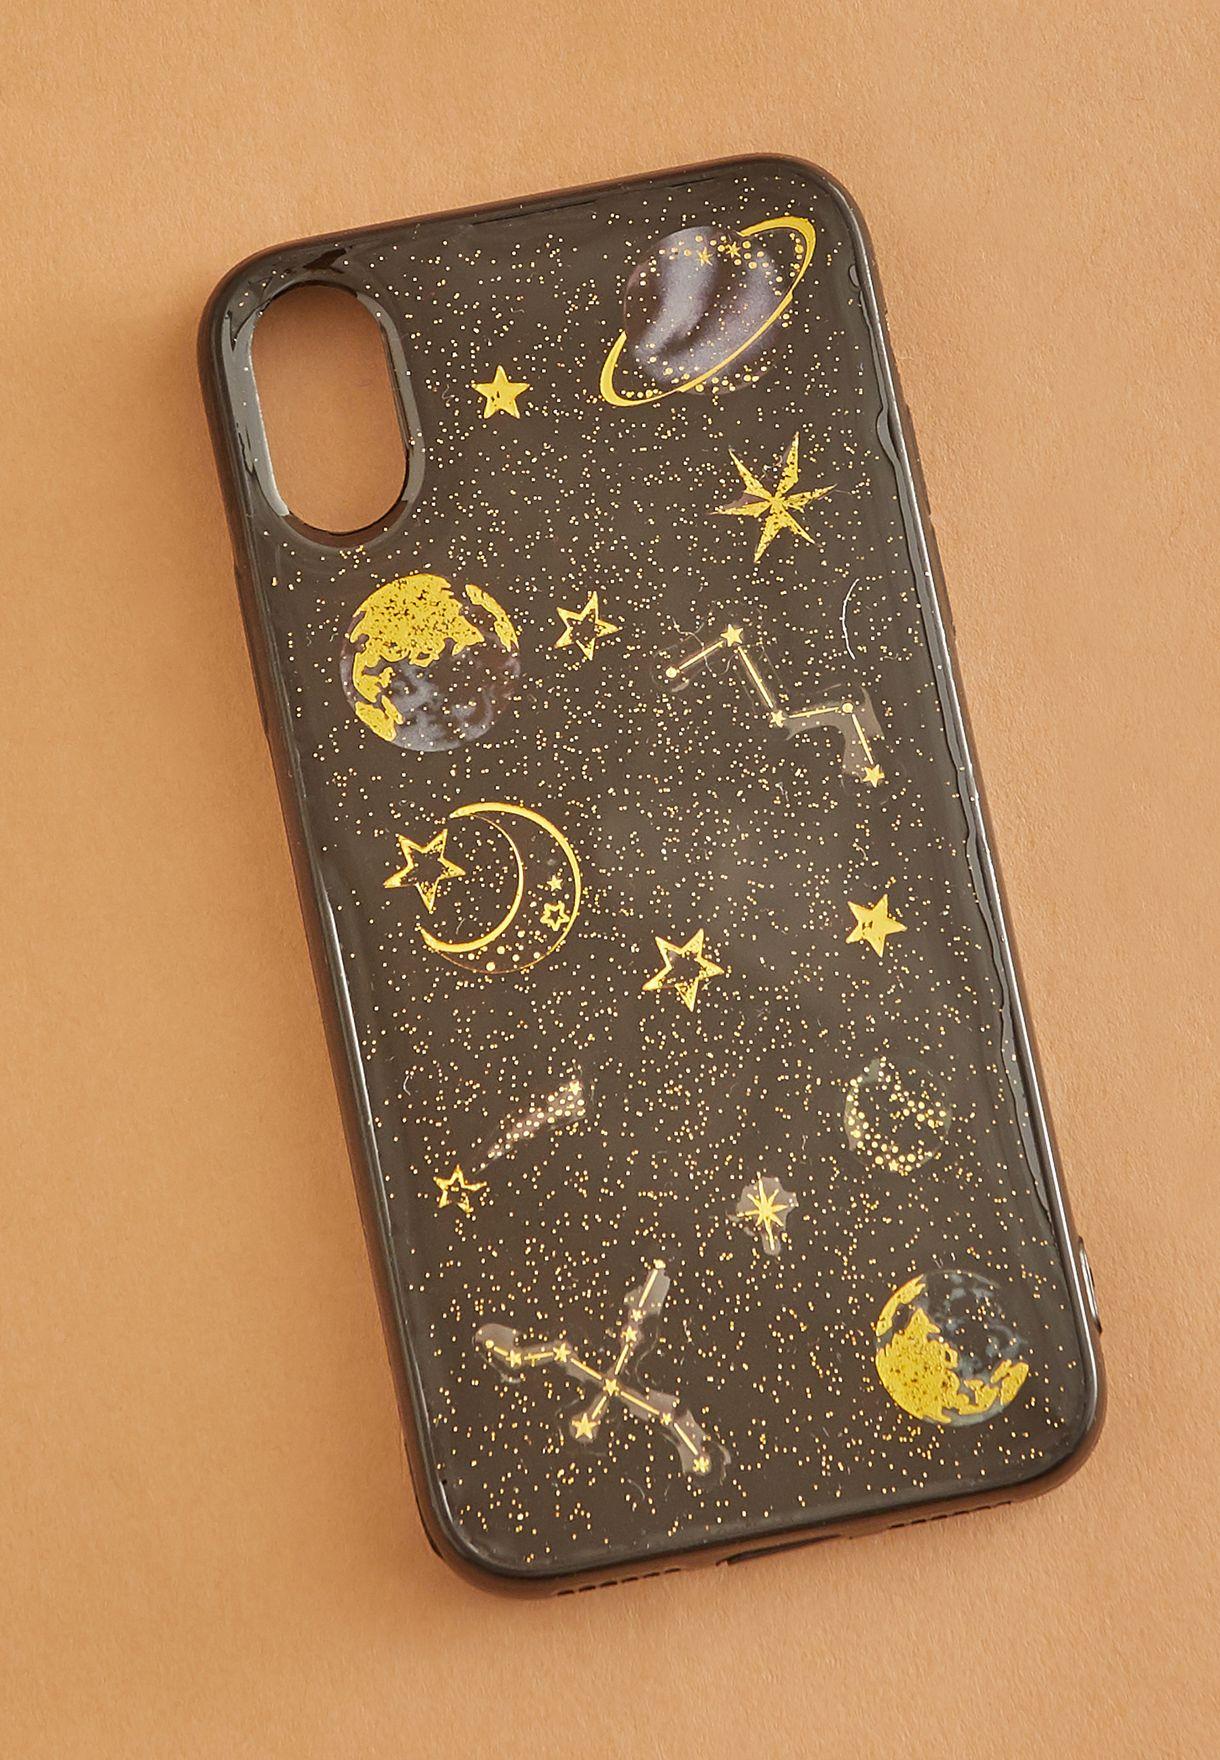 Glitter Planet iPhone-X Case